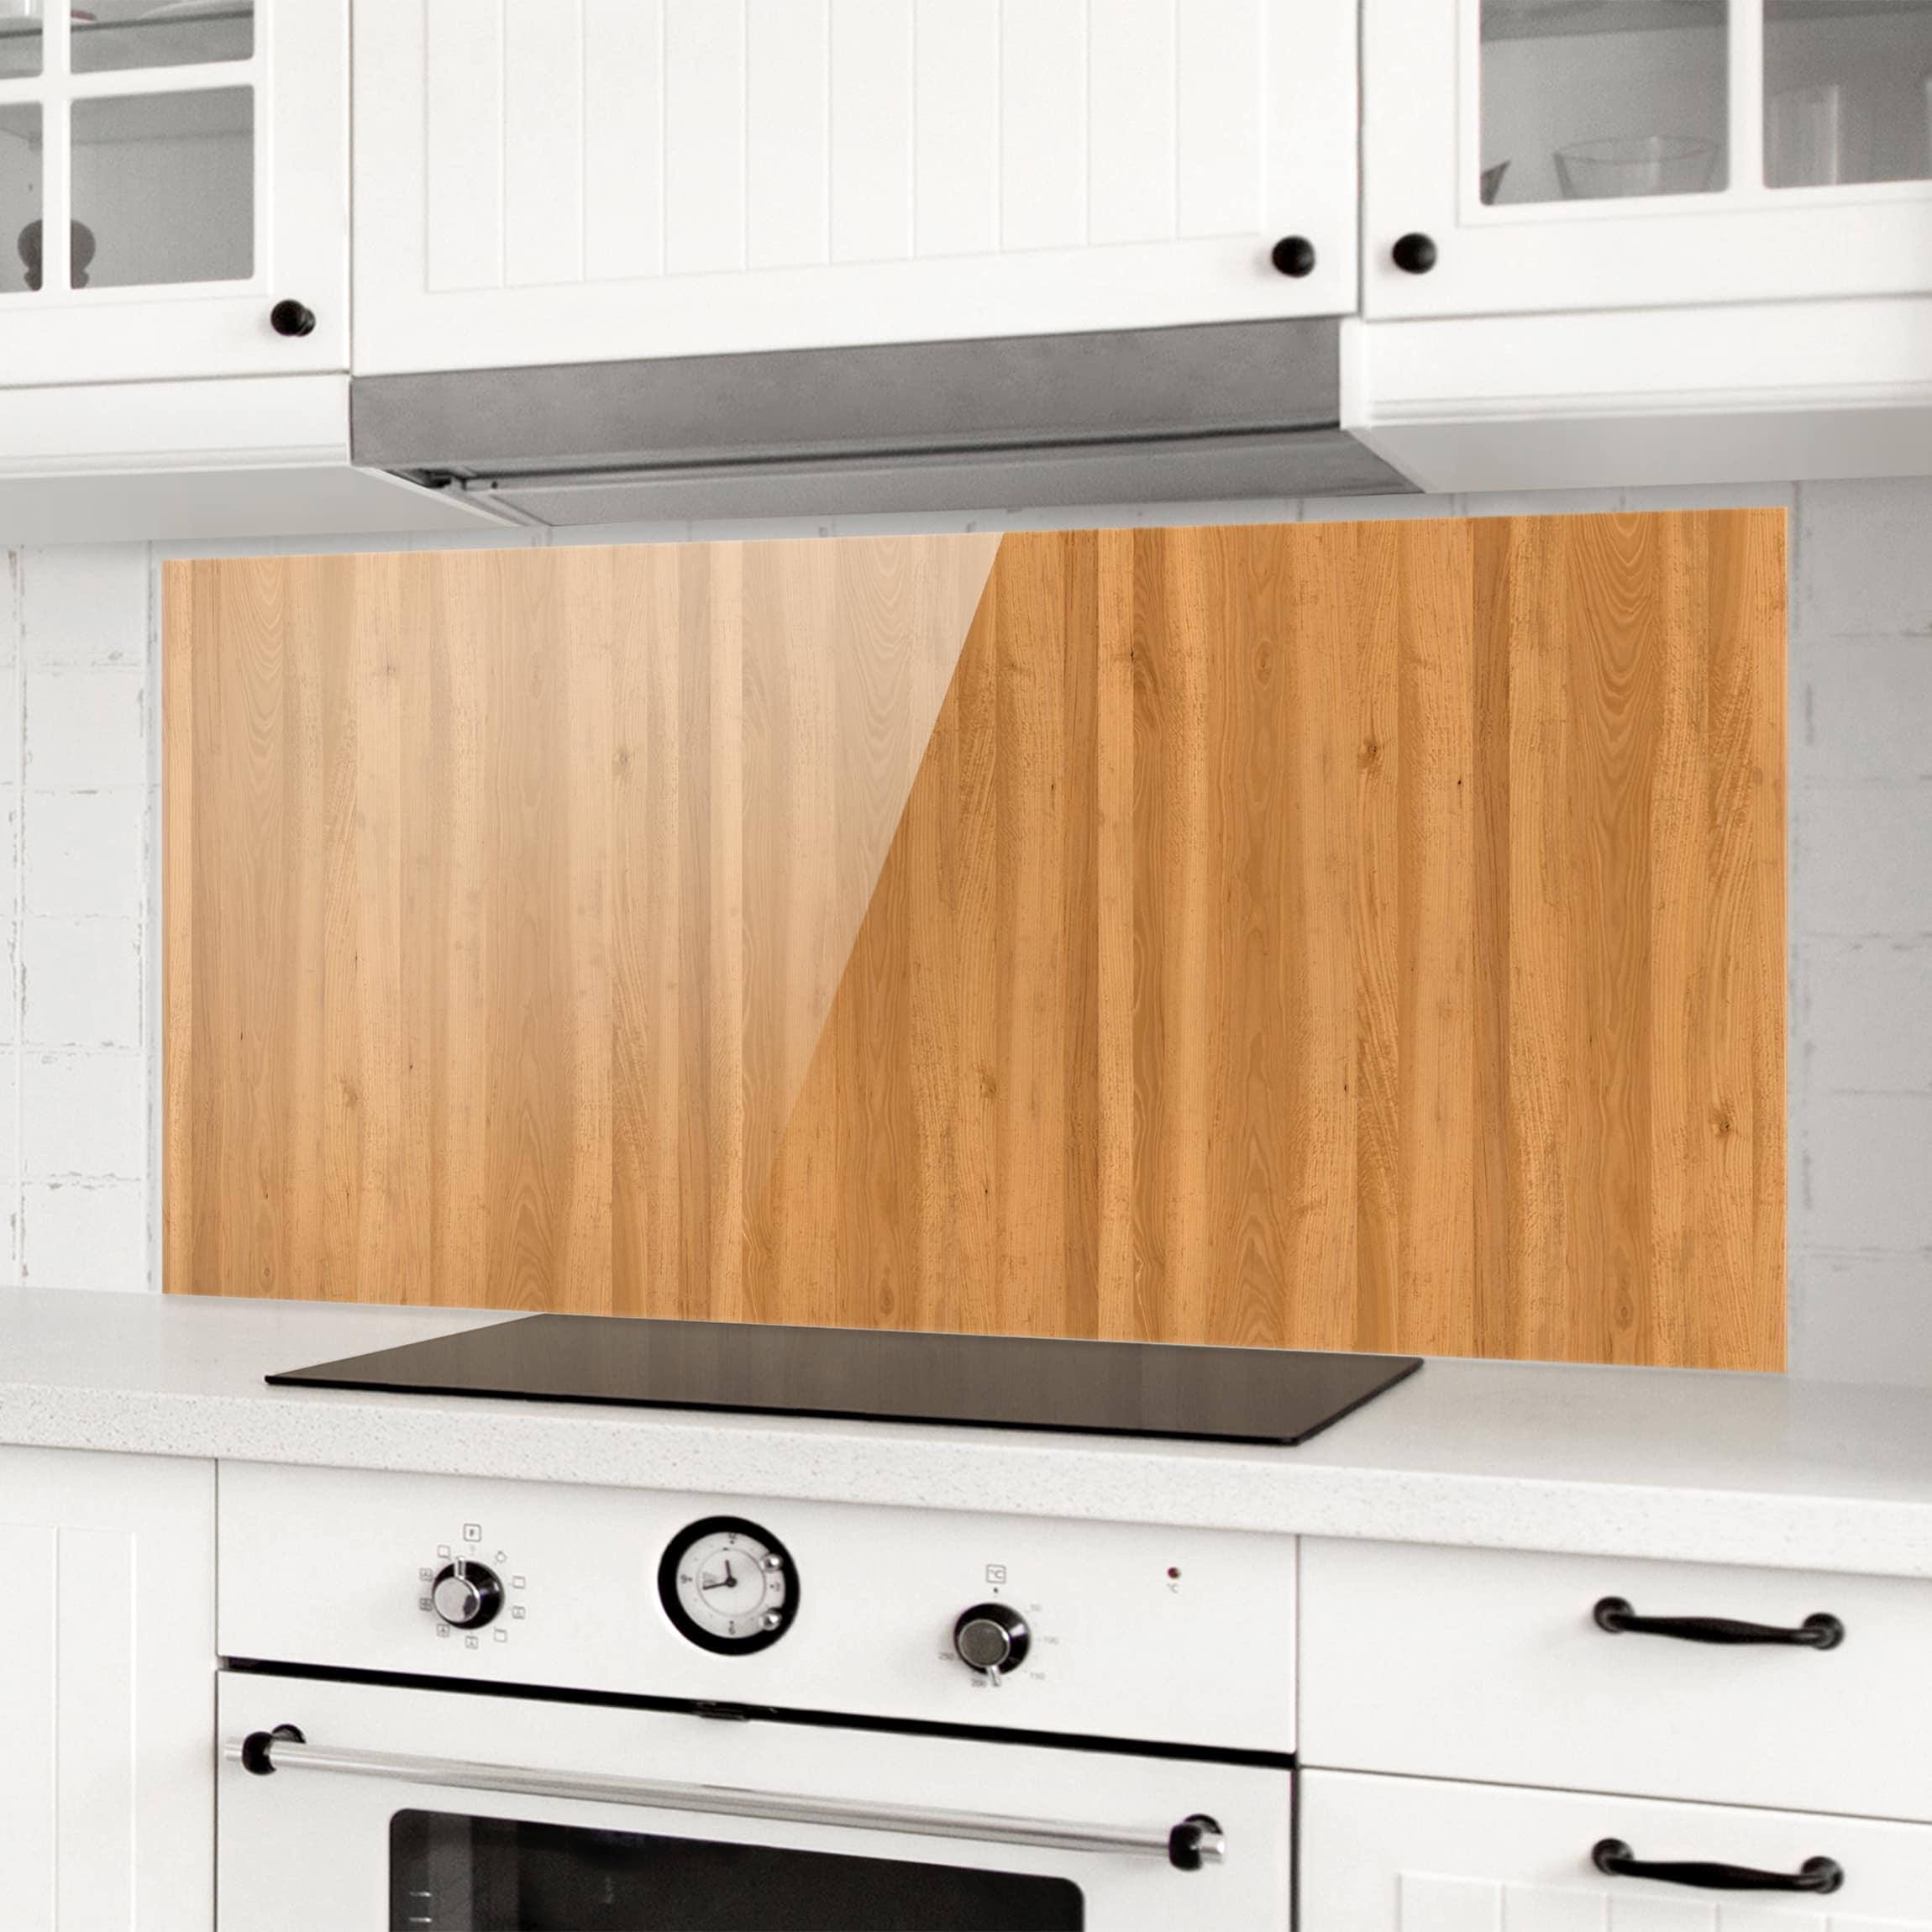 spritzschutz glas zitrone panorama quer. Black Bedroom Furniture Sets. Home Design Ideas